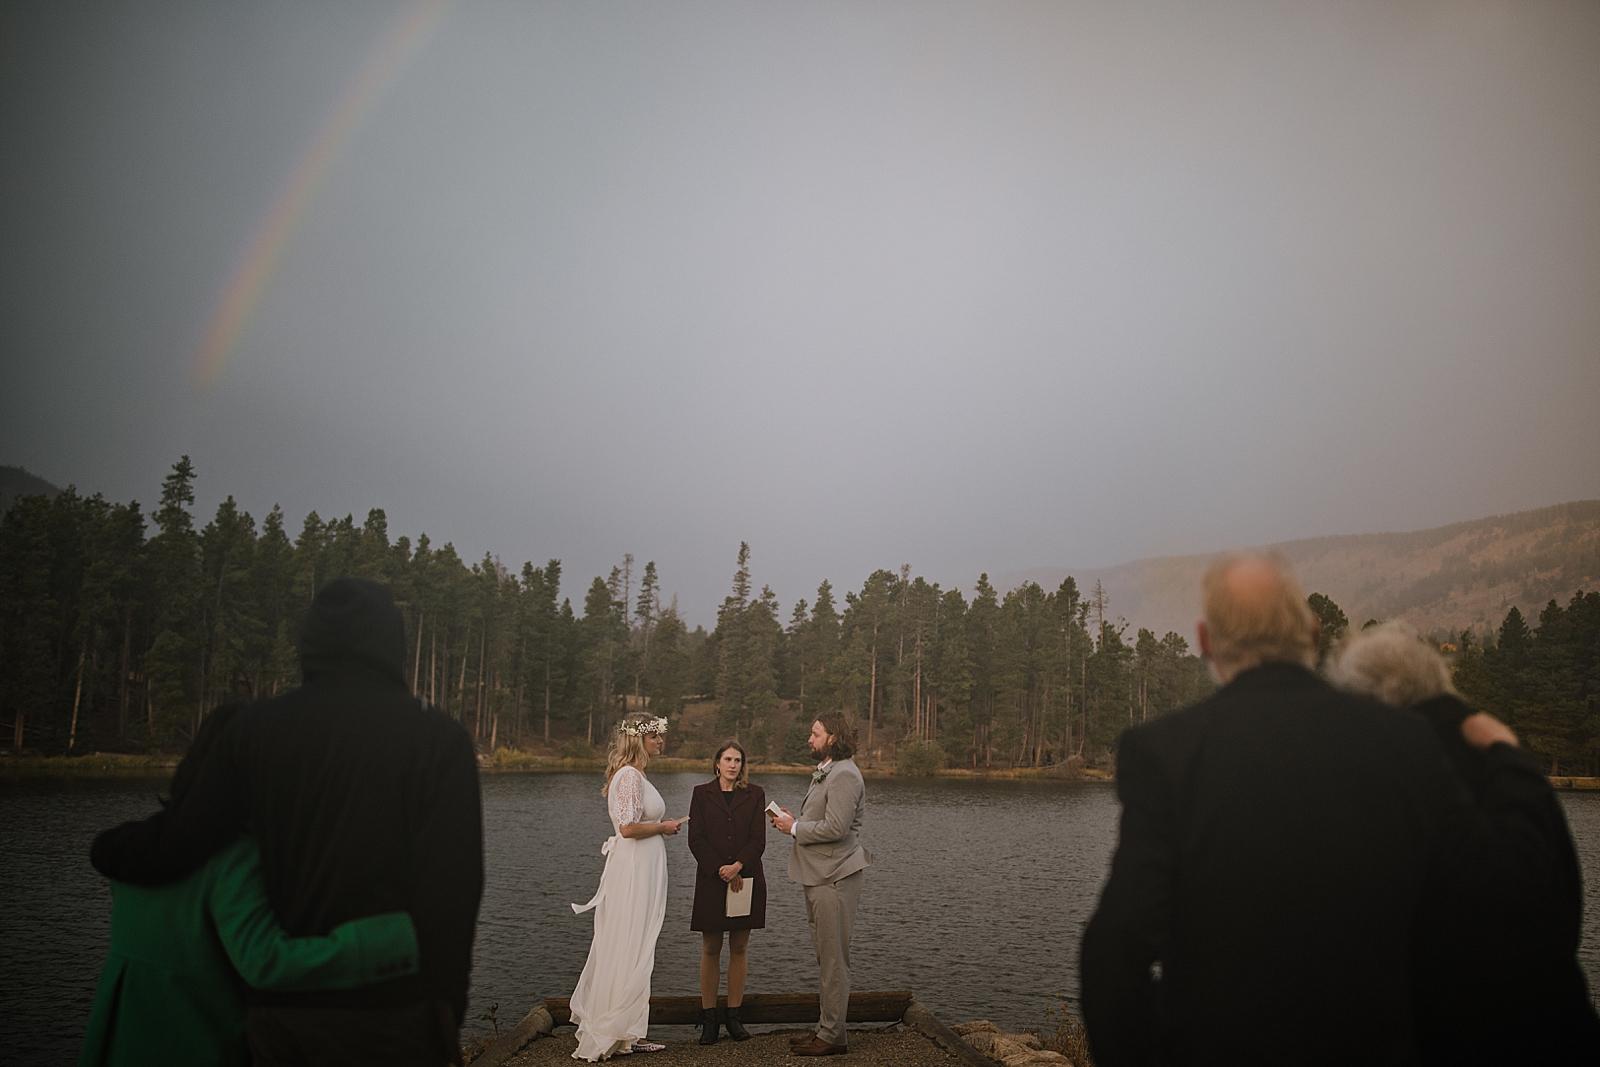 sprague lake dock elopement, sunrise elopement, colorado elopement, sprague lake elopement, rain on wedding day, rocky mountain national park elopement, adventurous colorado hiking elopement